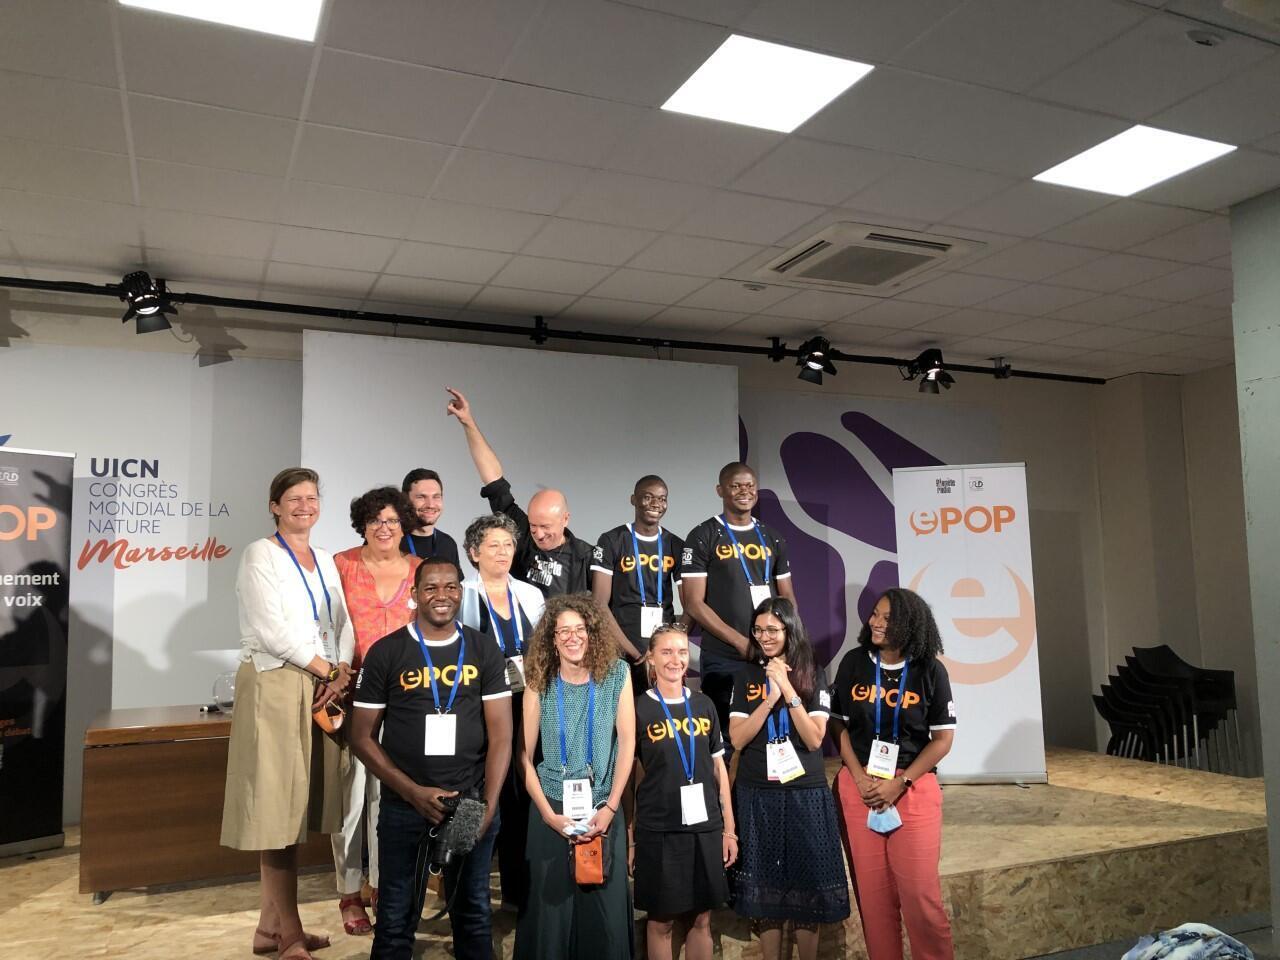 EPOP competition participants and RFI Planete Radio staff_Marseille_6 Sept 2021